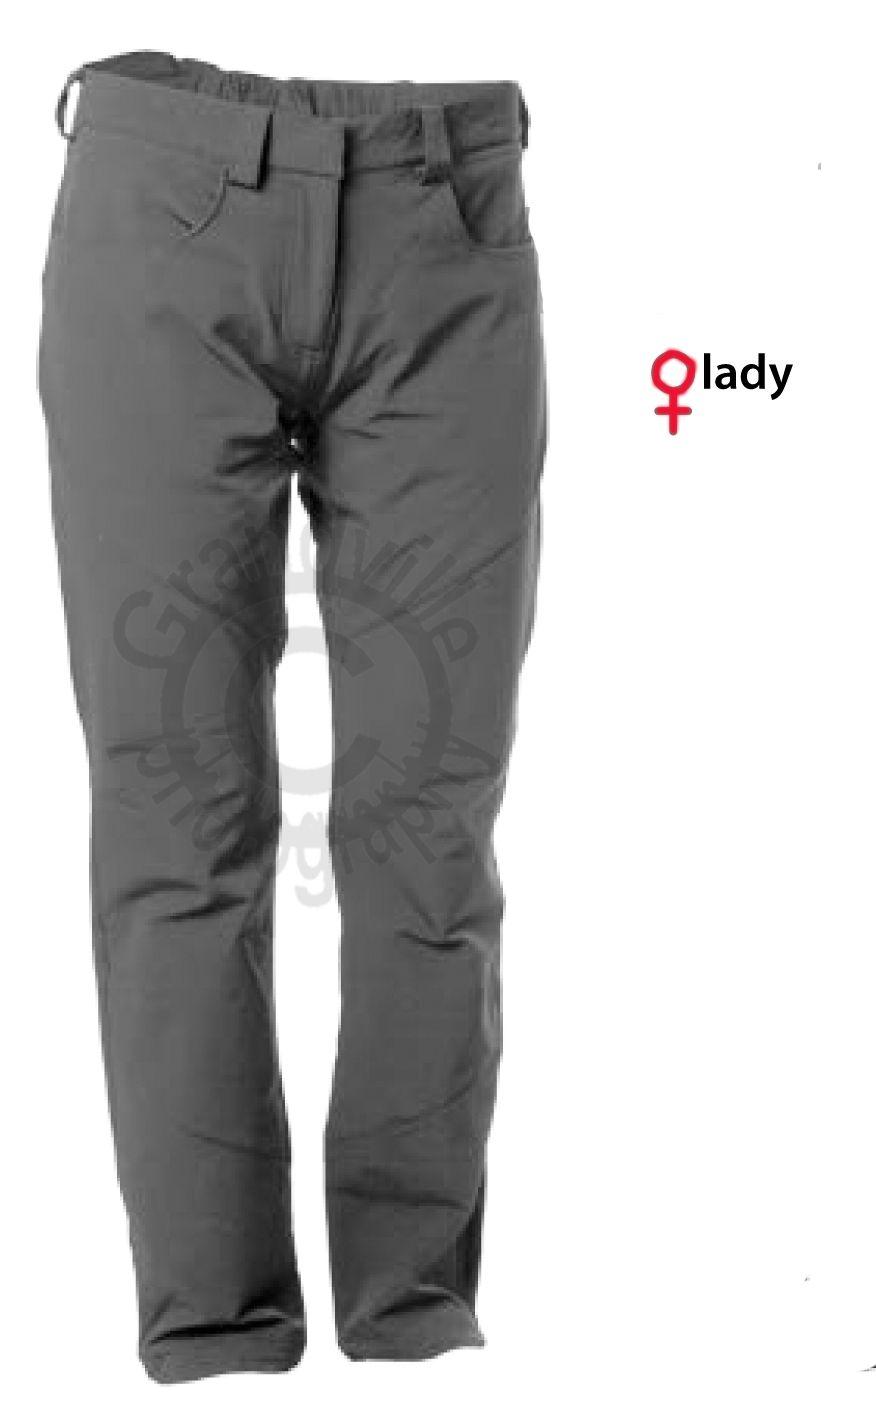 Tazz-Sport - Warmpeace Flea lady frost grey / frost grey dámské kalhoty